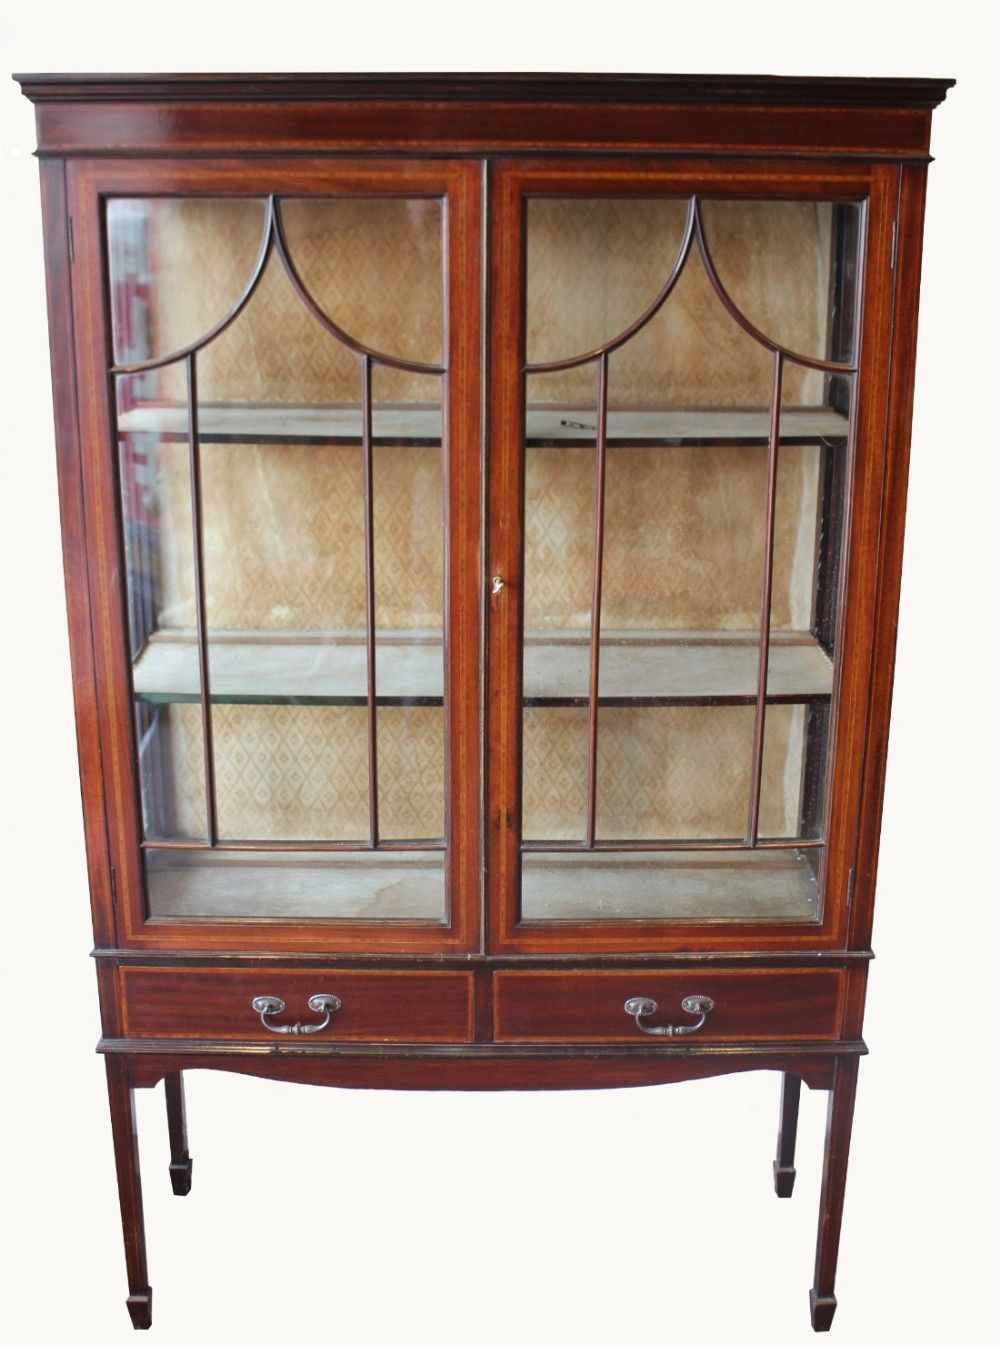 An Edwardian Mahogany And Inlaid Display Cabinet Kitchen Cabinets And Countertops Mahogany Cabinets Furniture Makeover